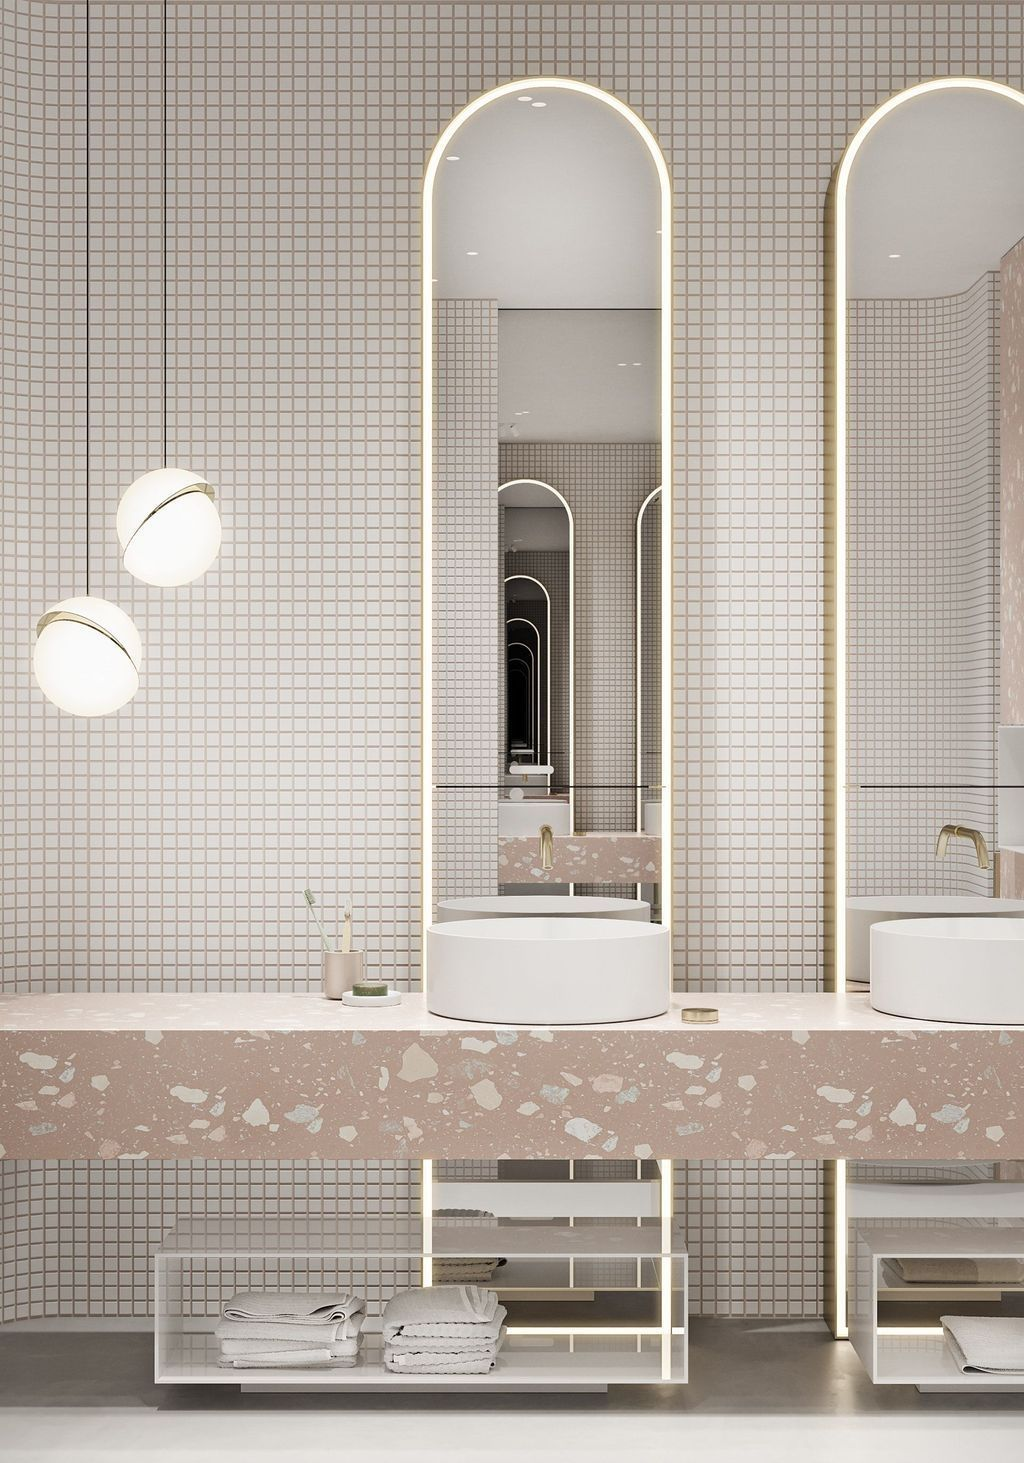 20 Surpirising Apartment Bathroom Renovation Design Ideas To Try